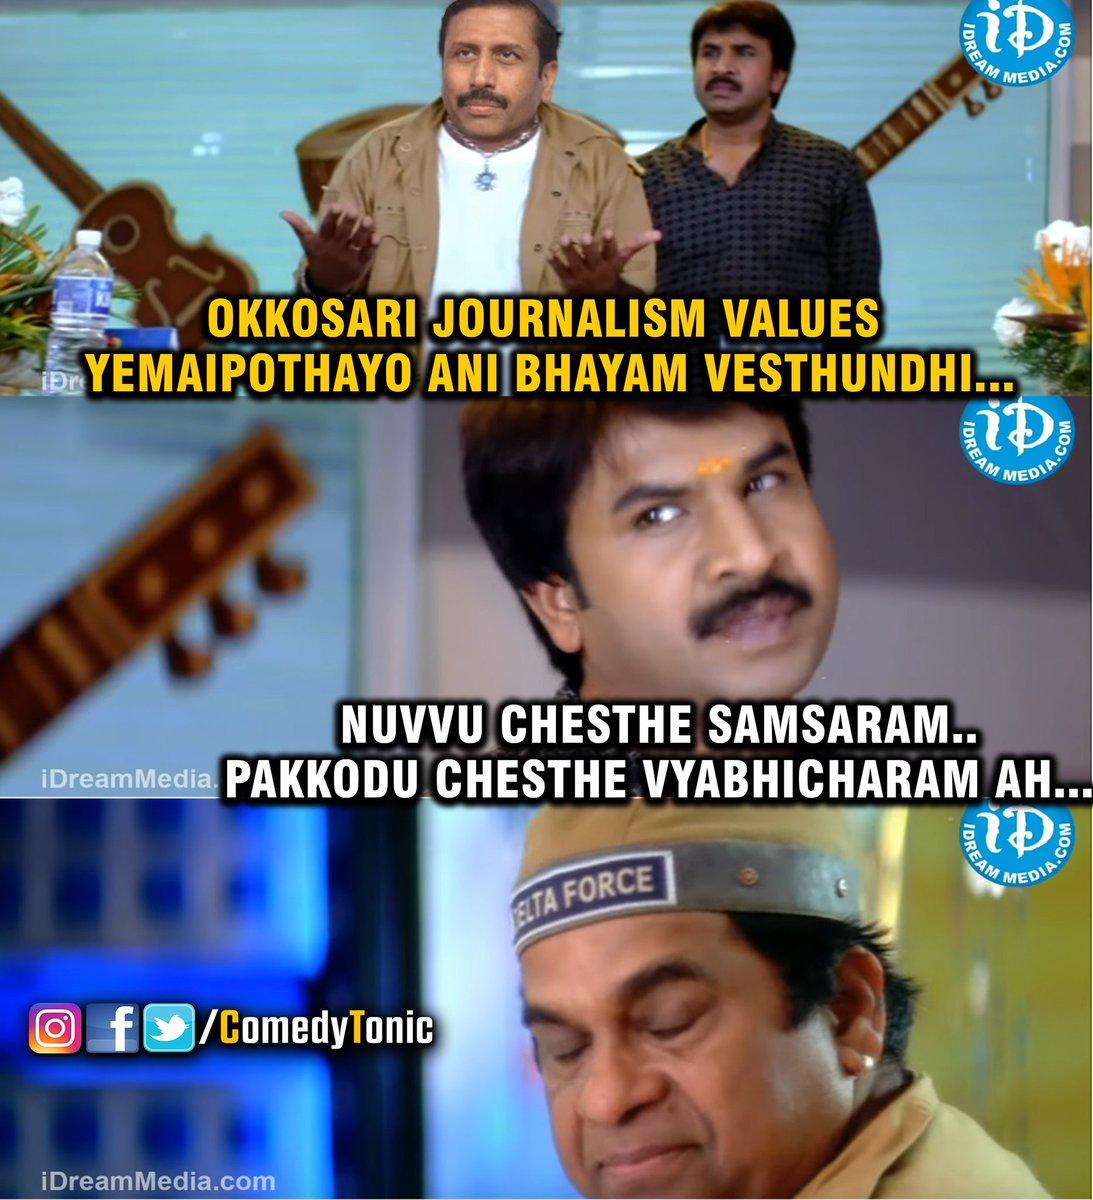 raviprakash-an-inhuman-journalist